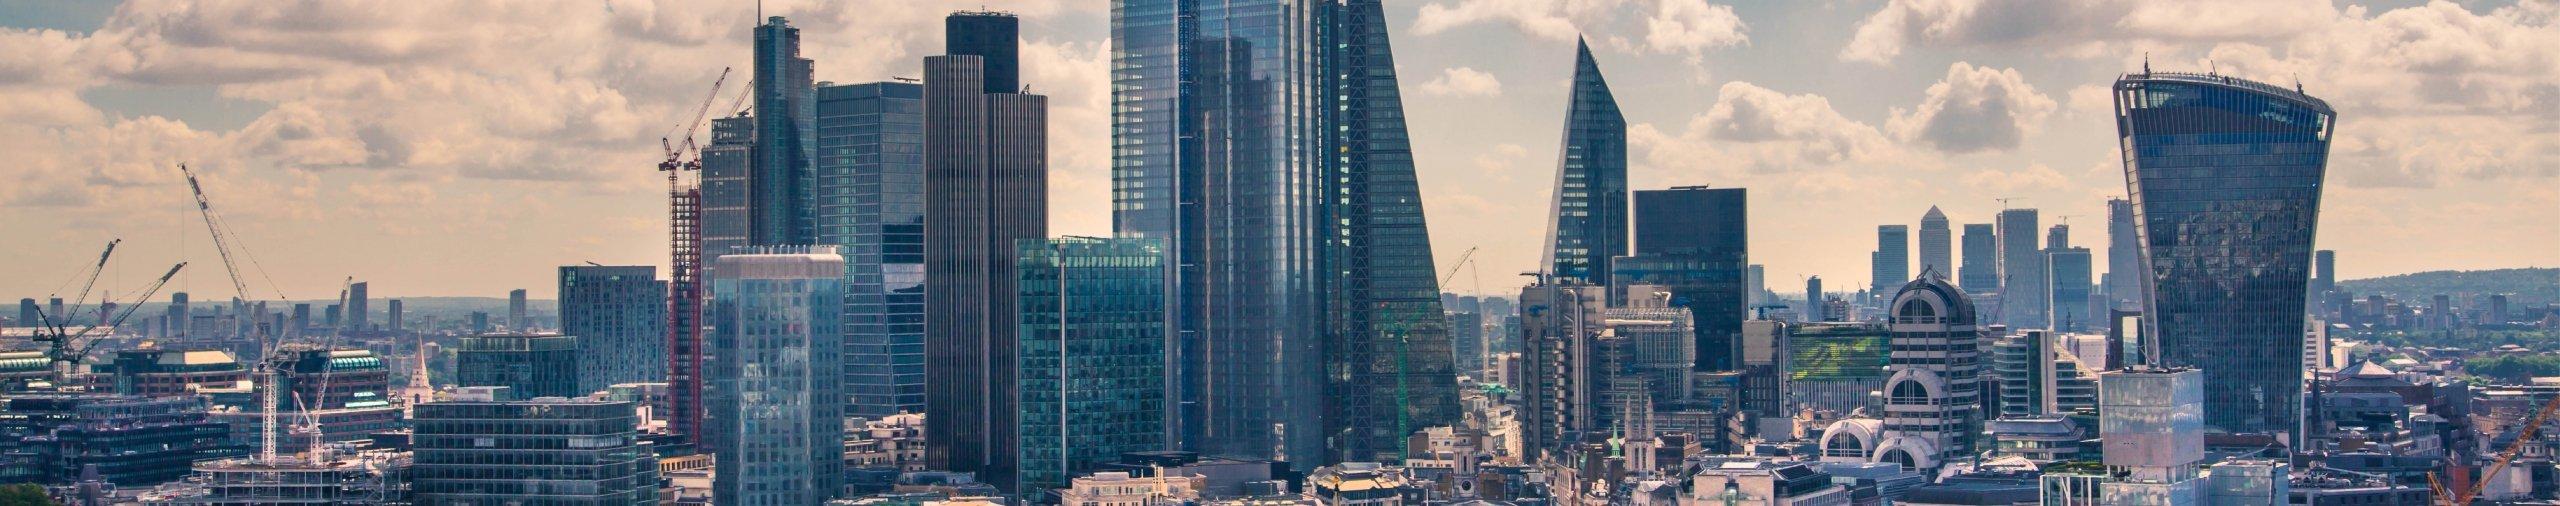 net zero carbon tall buildings